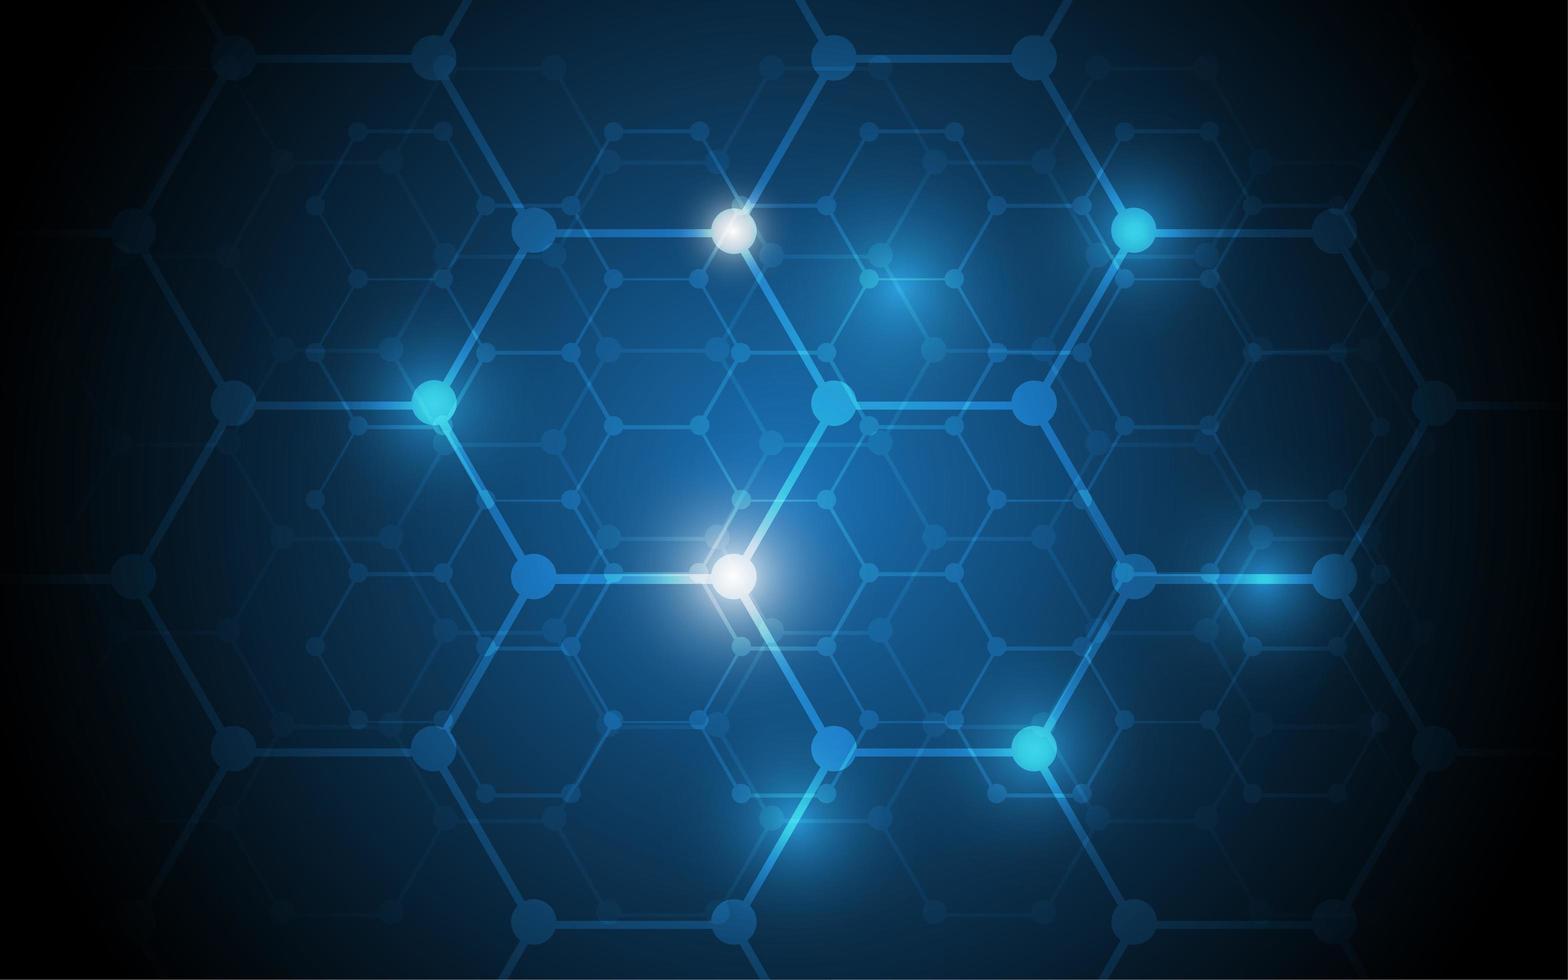 Abstract technology hexagon hi tech background  vector